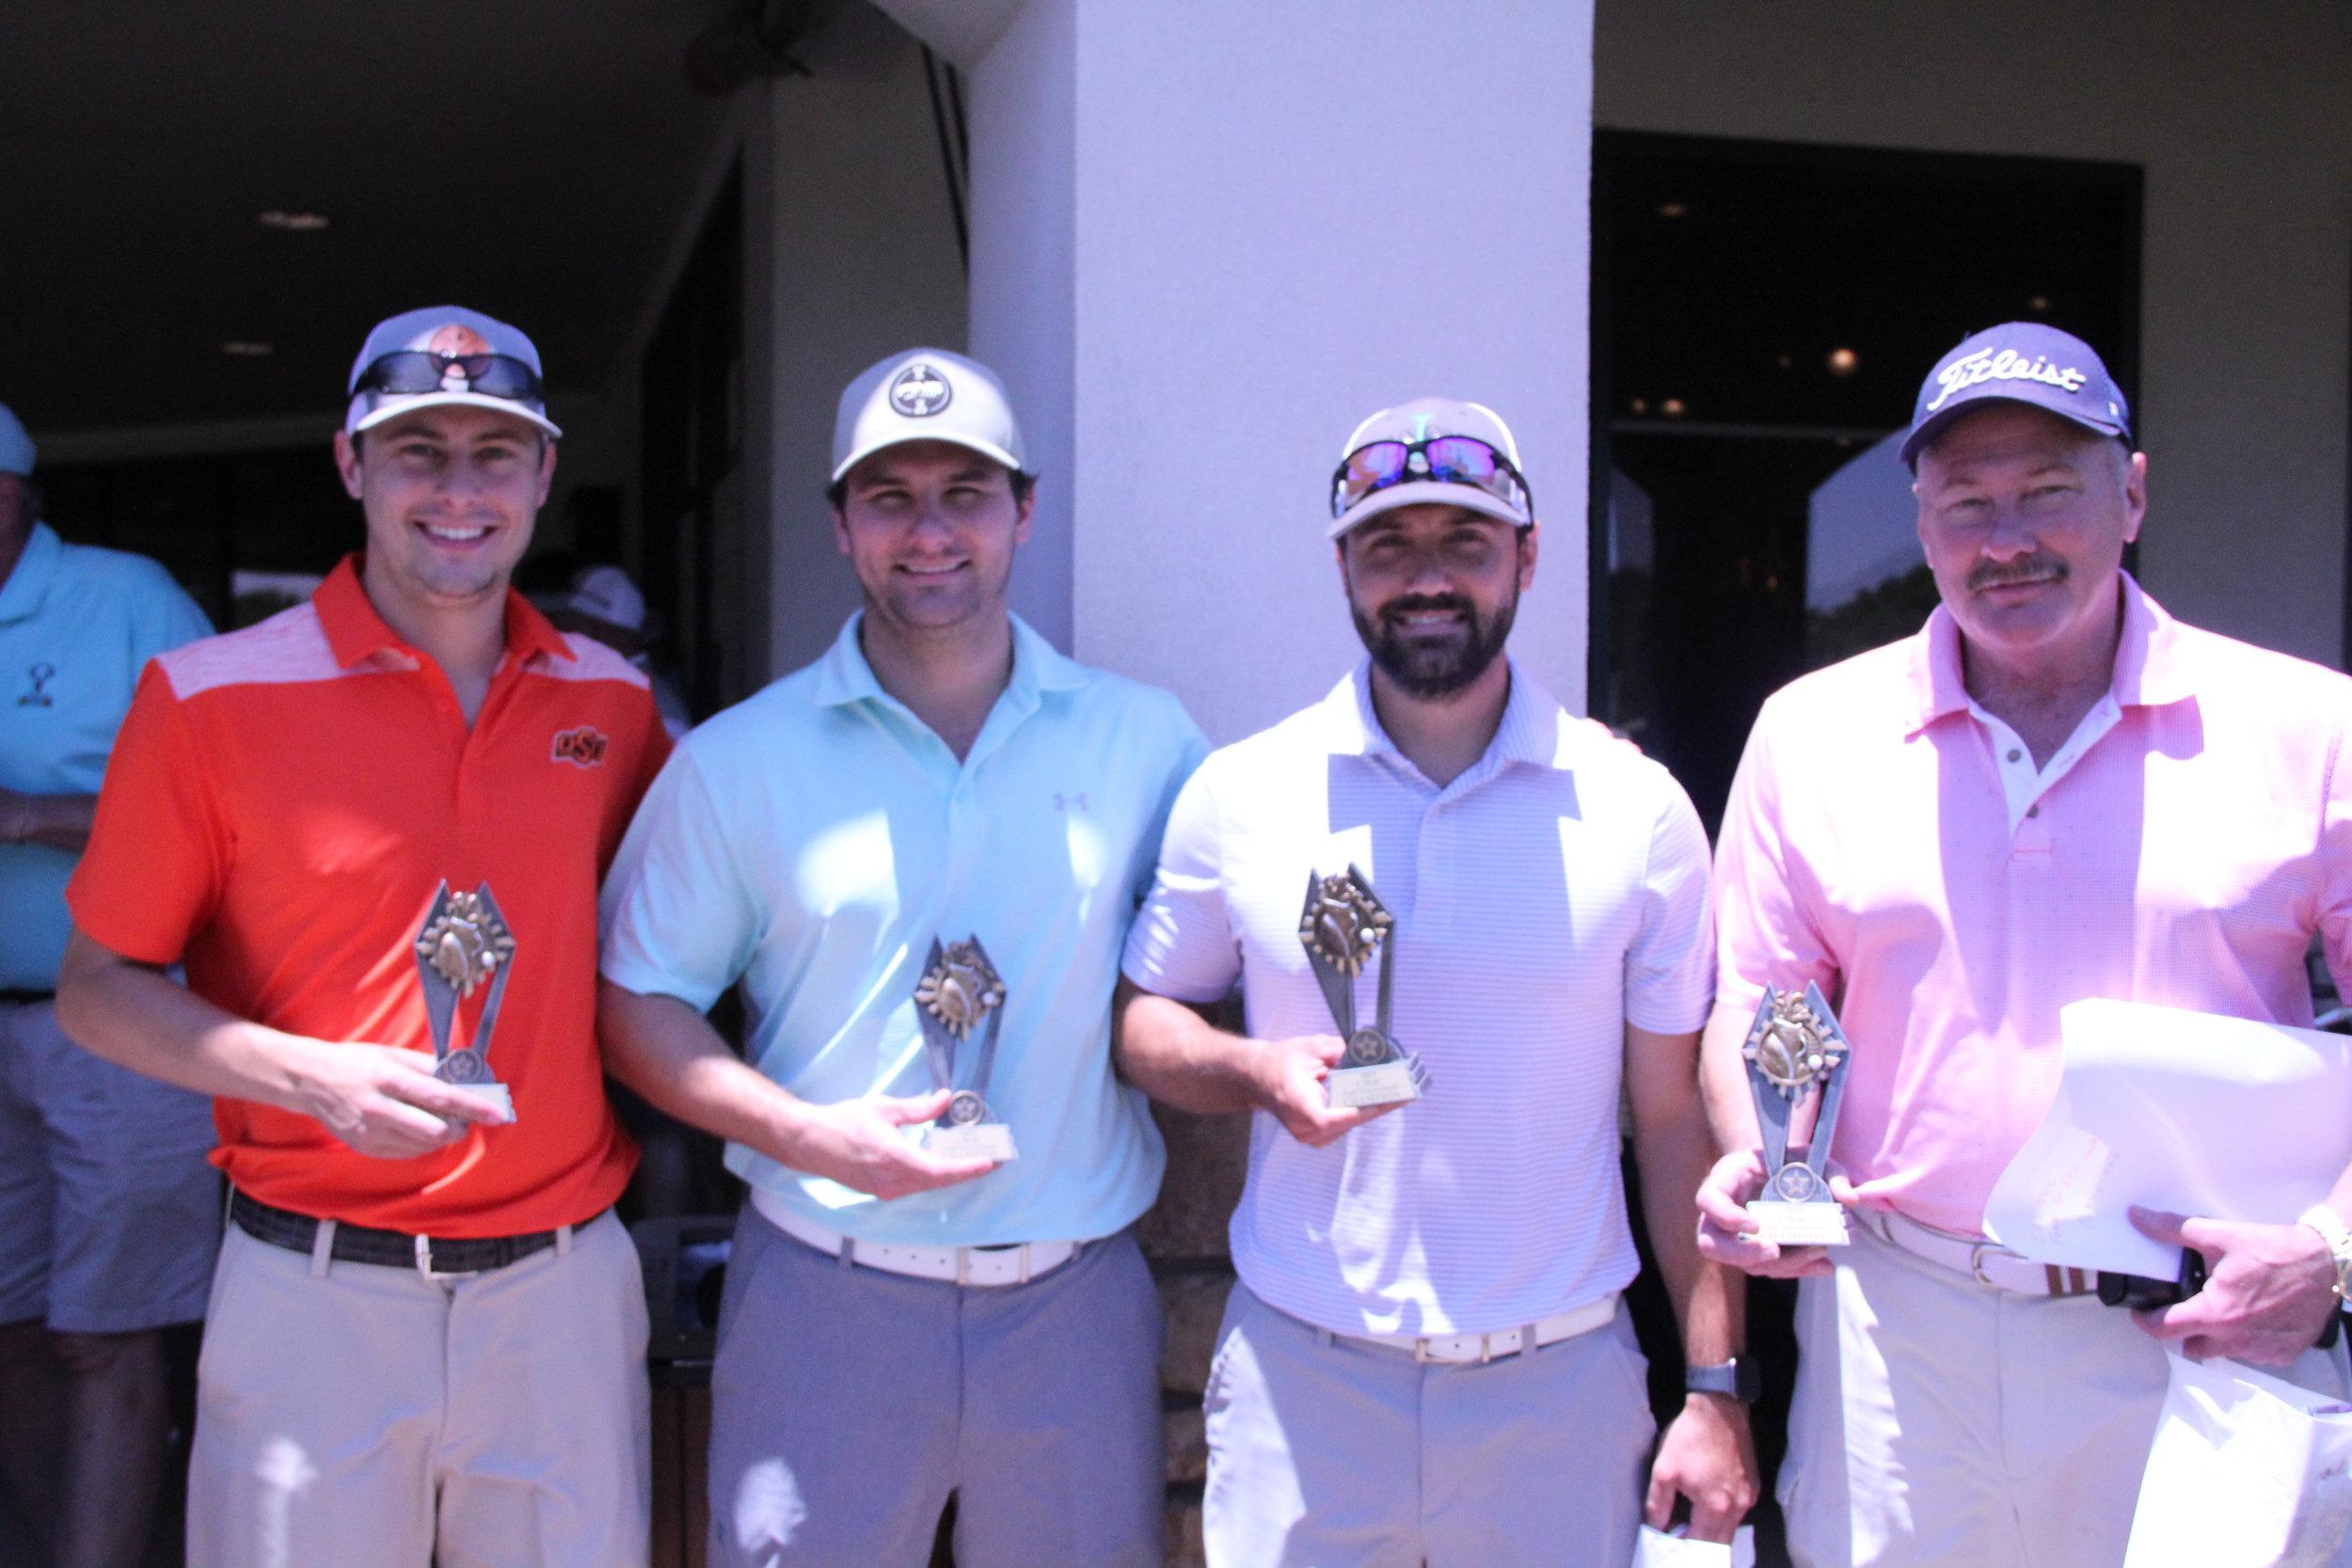 CWJC golf 2.JPG